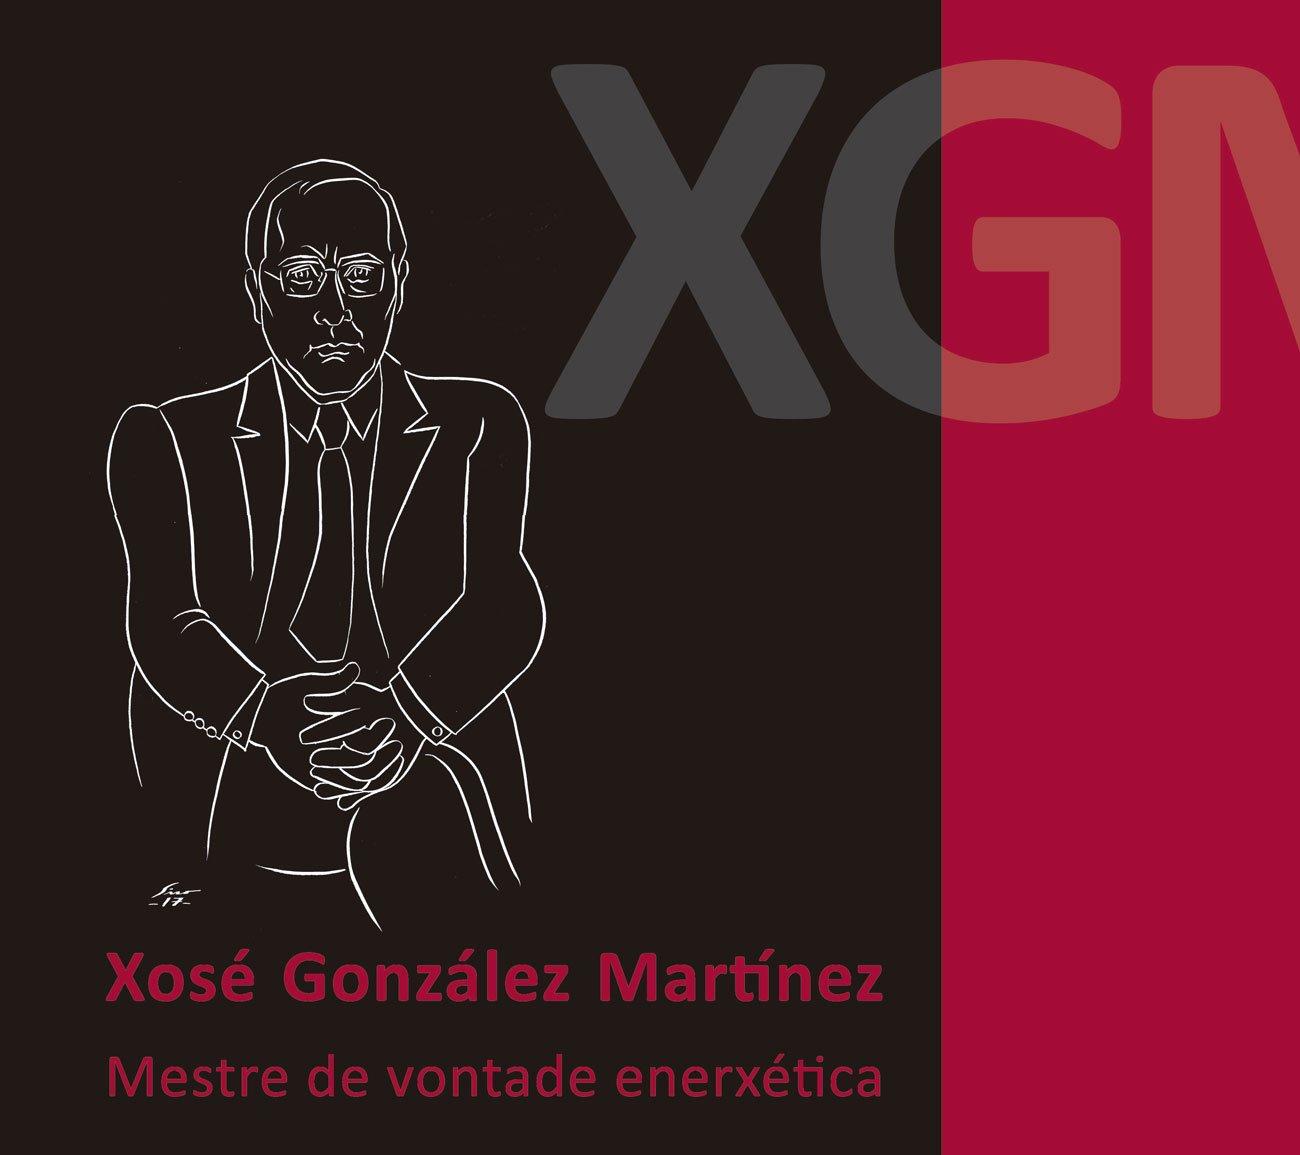 Xosé González Martínez / Mestre de vontade enerxética